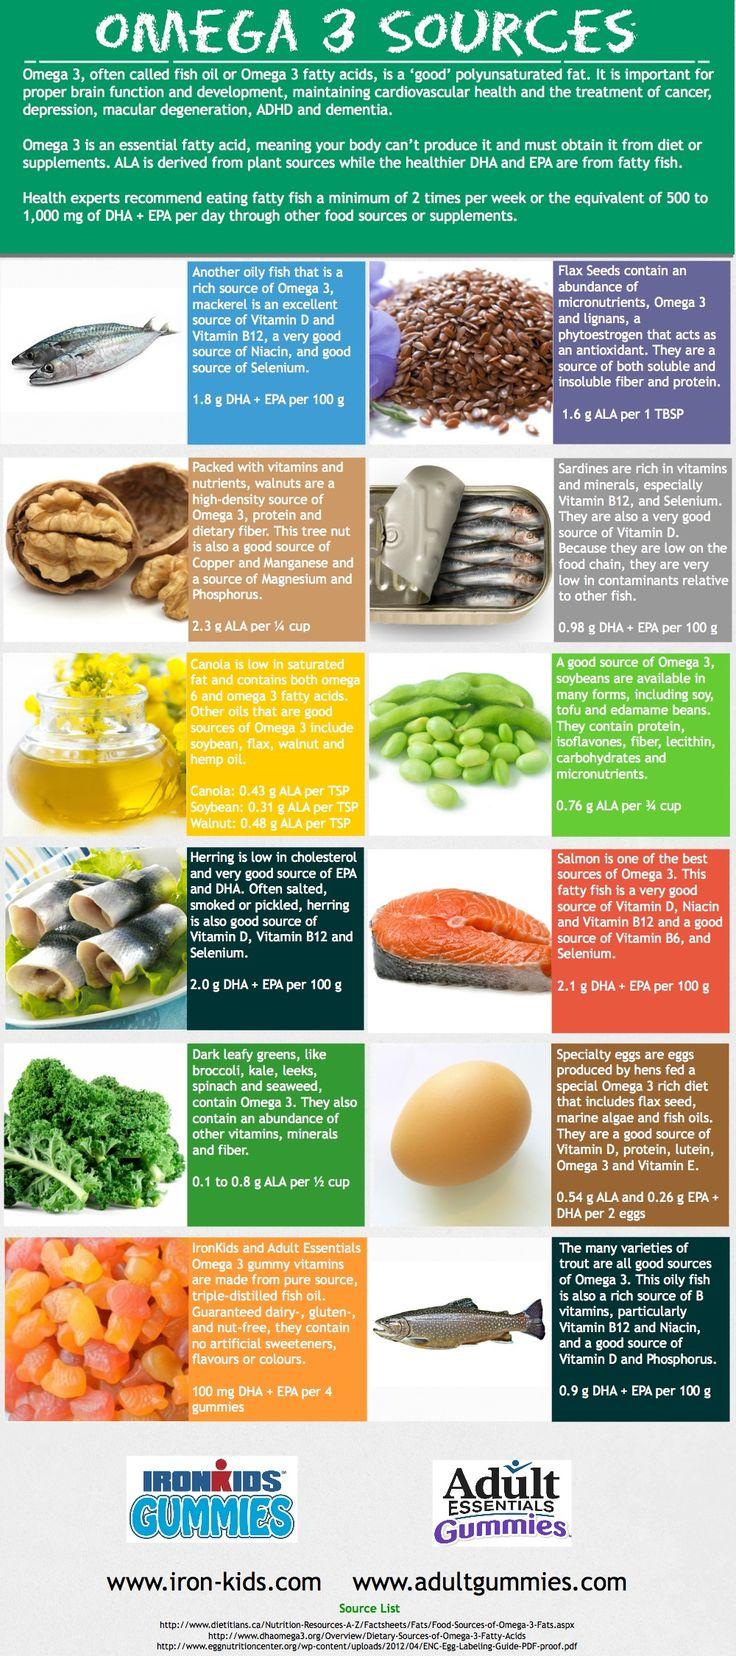 best omega3 sources - Omax 3